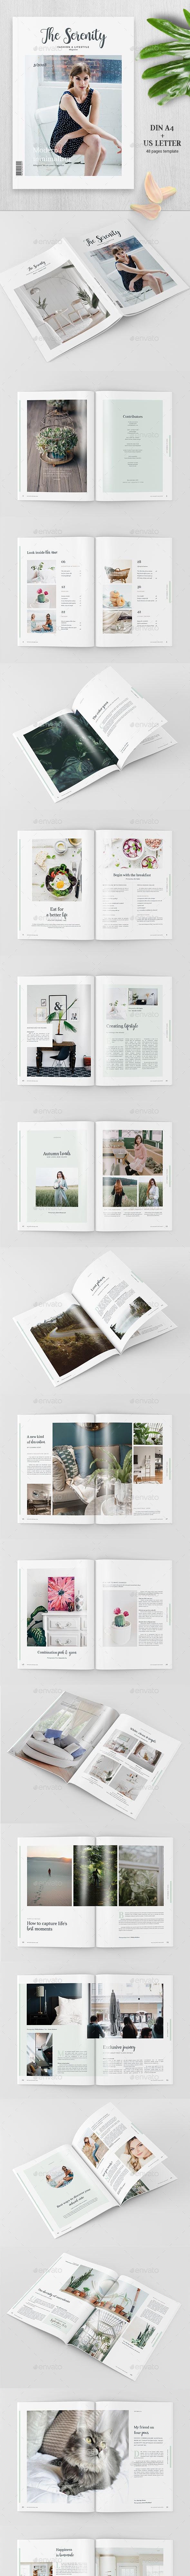 Serenity - Clean Magazine Template - Magazines Print Templates